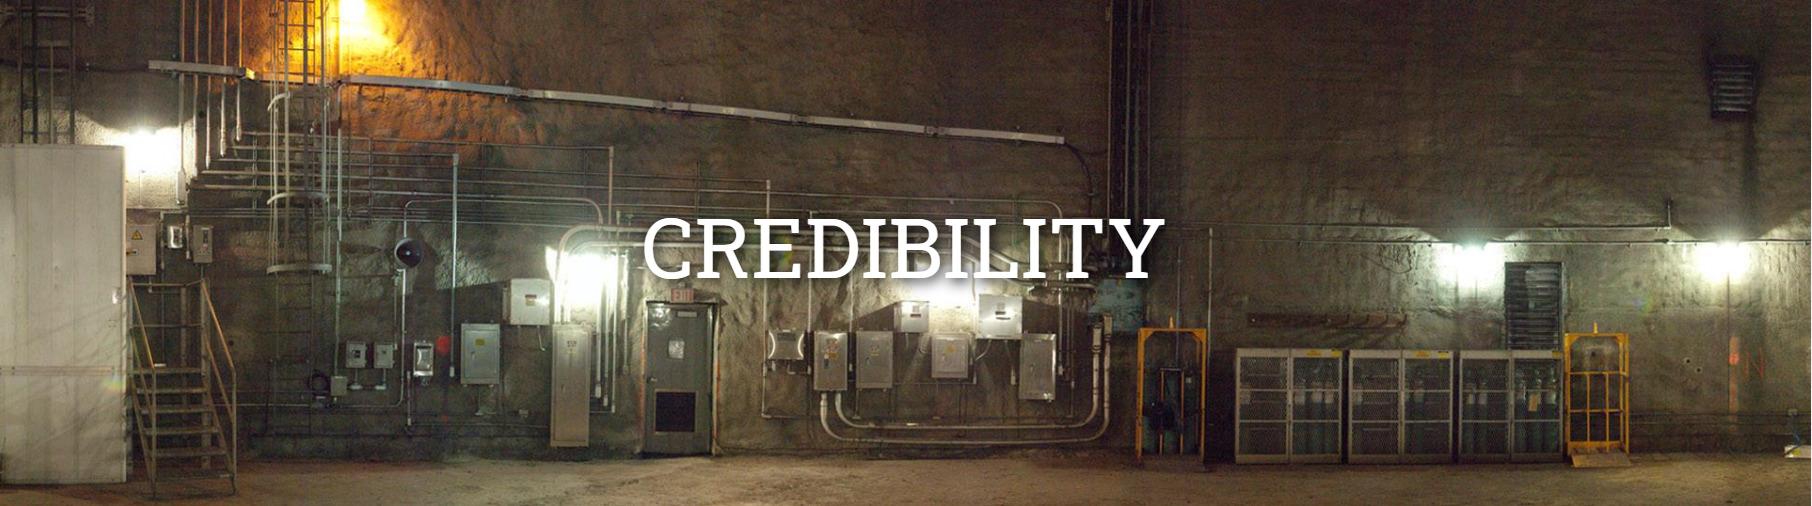 slider-credibility